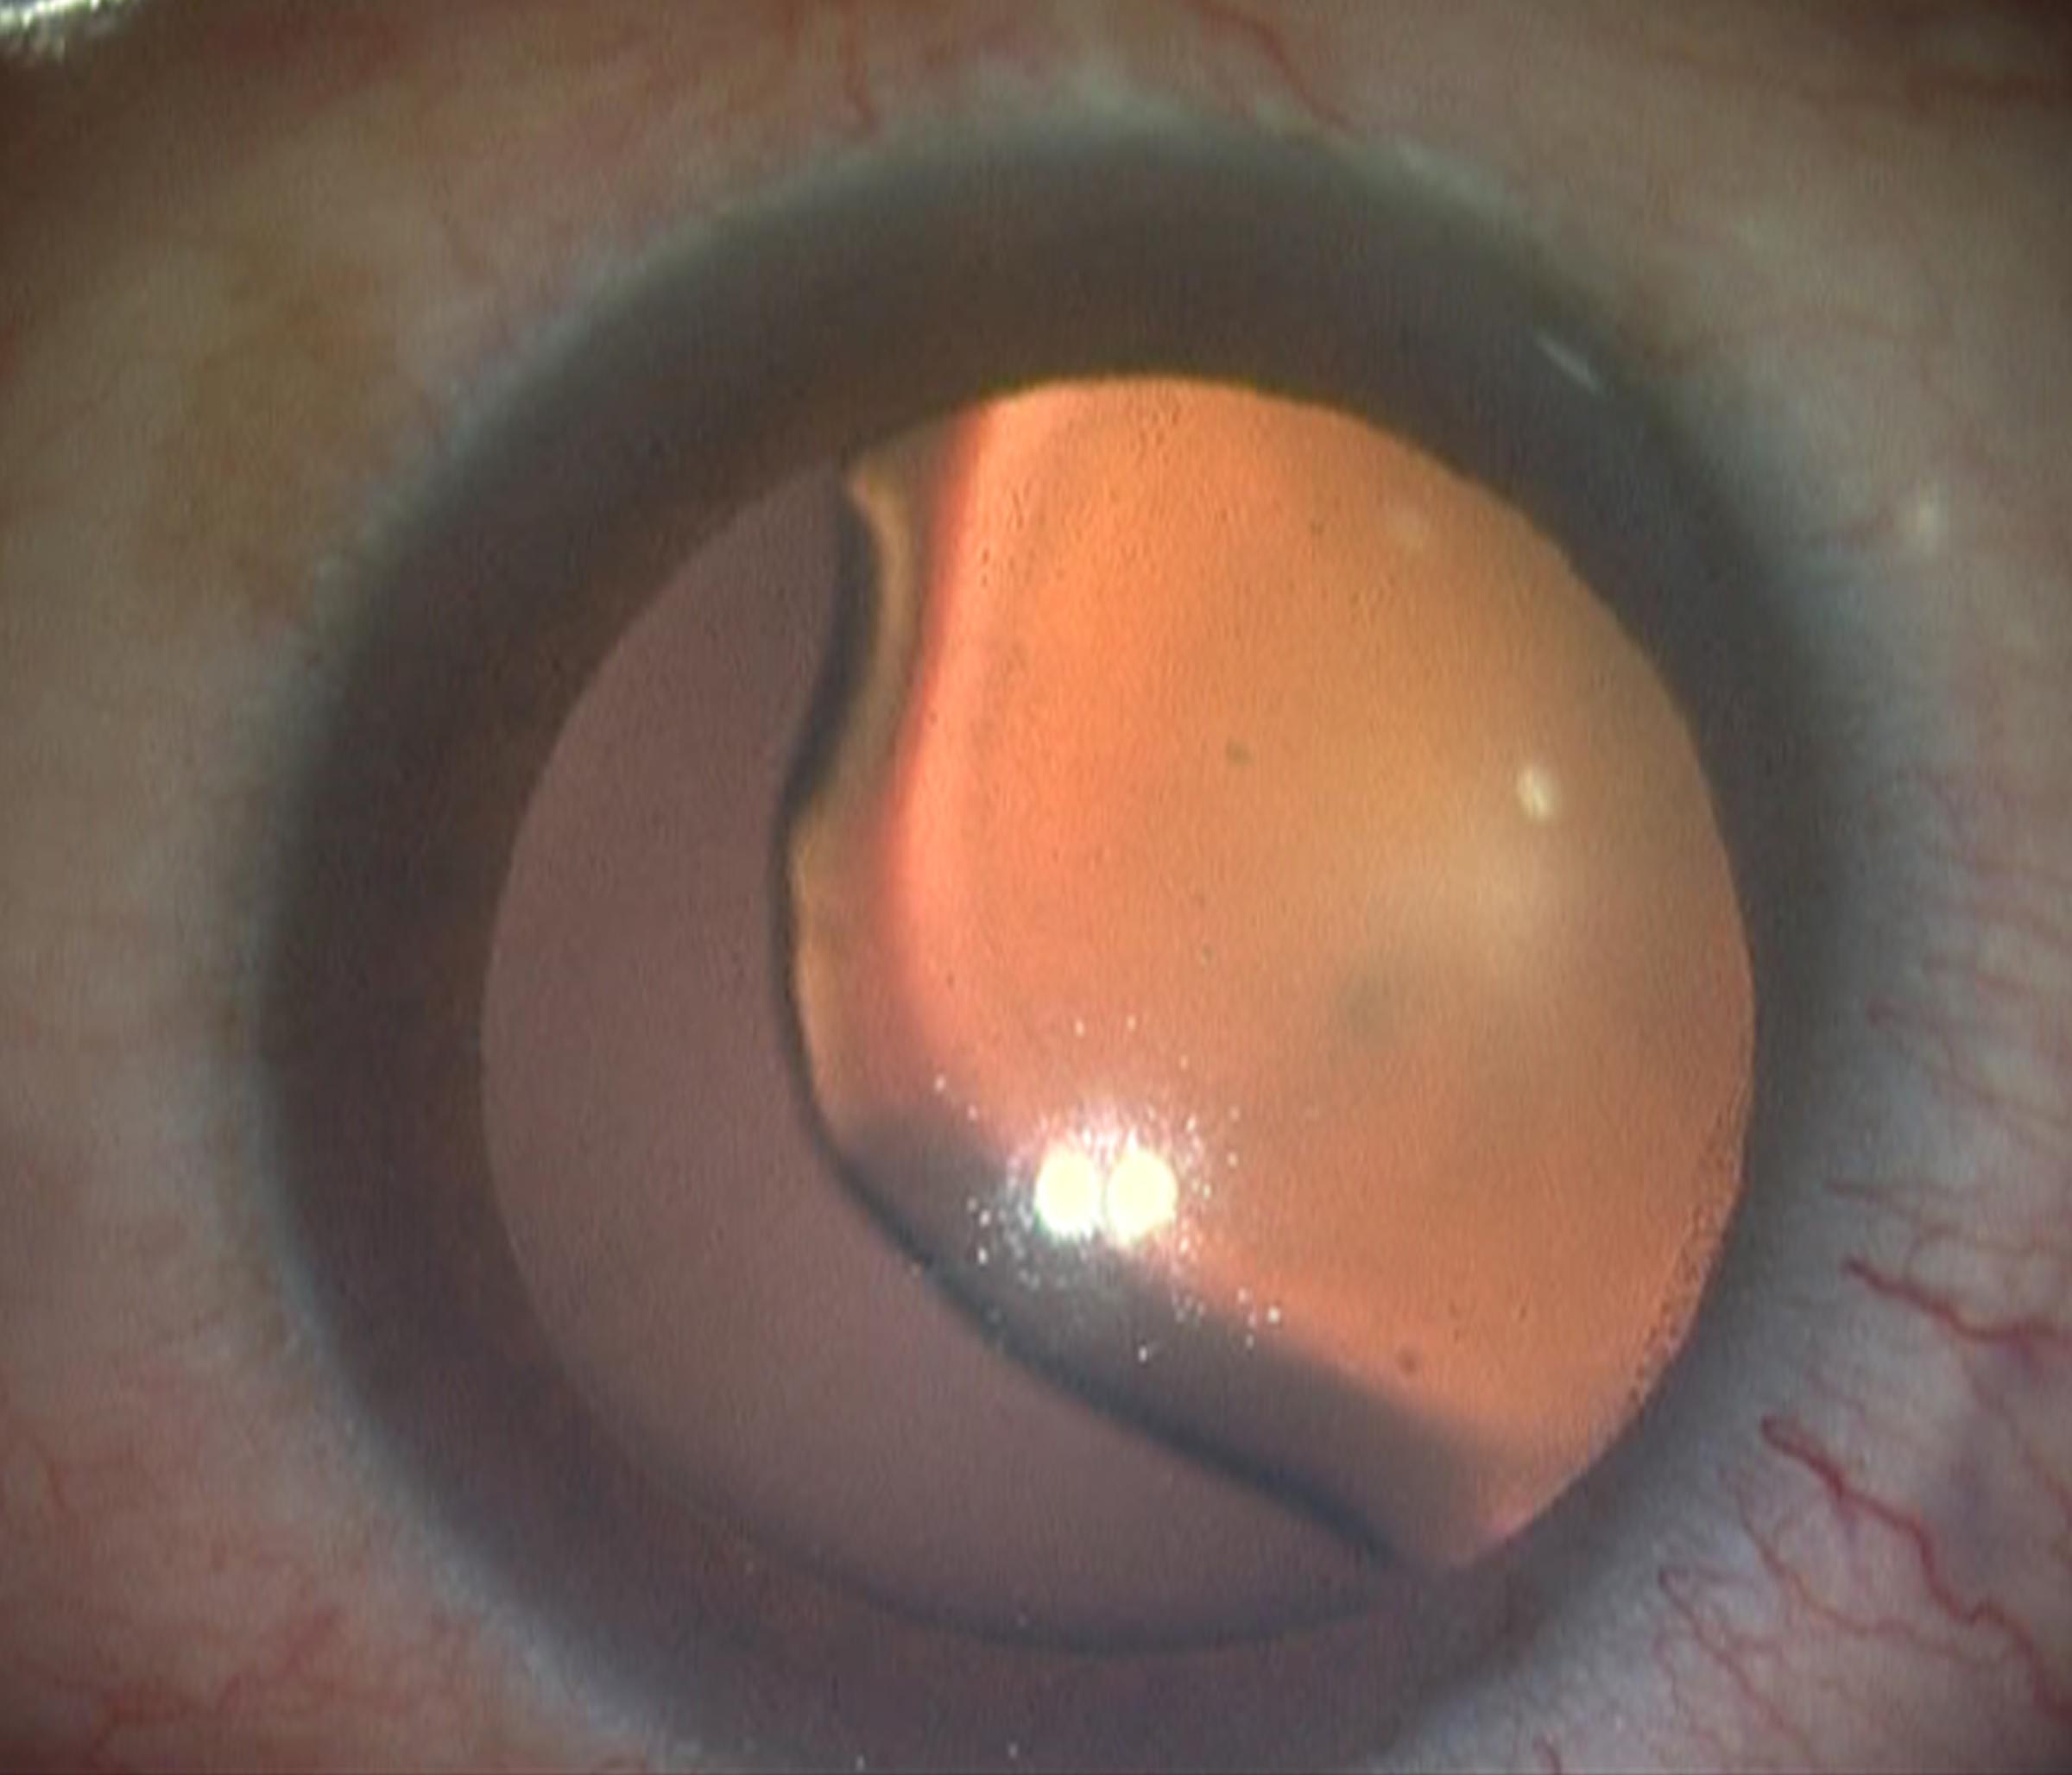 Intraocular lens (IOL) at 360marketupdates.com